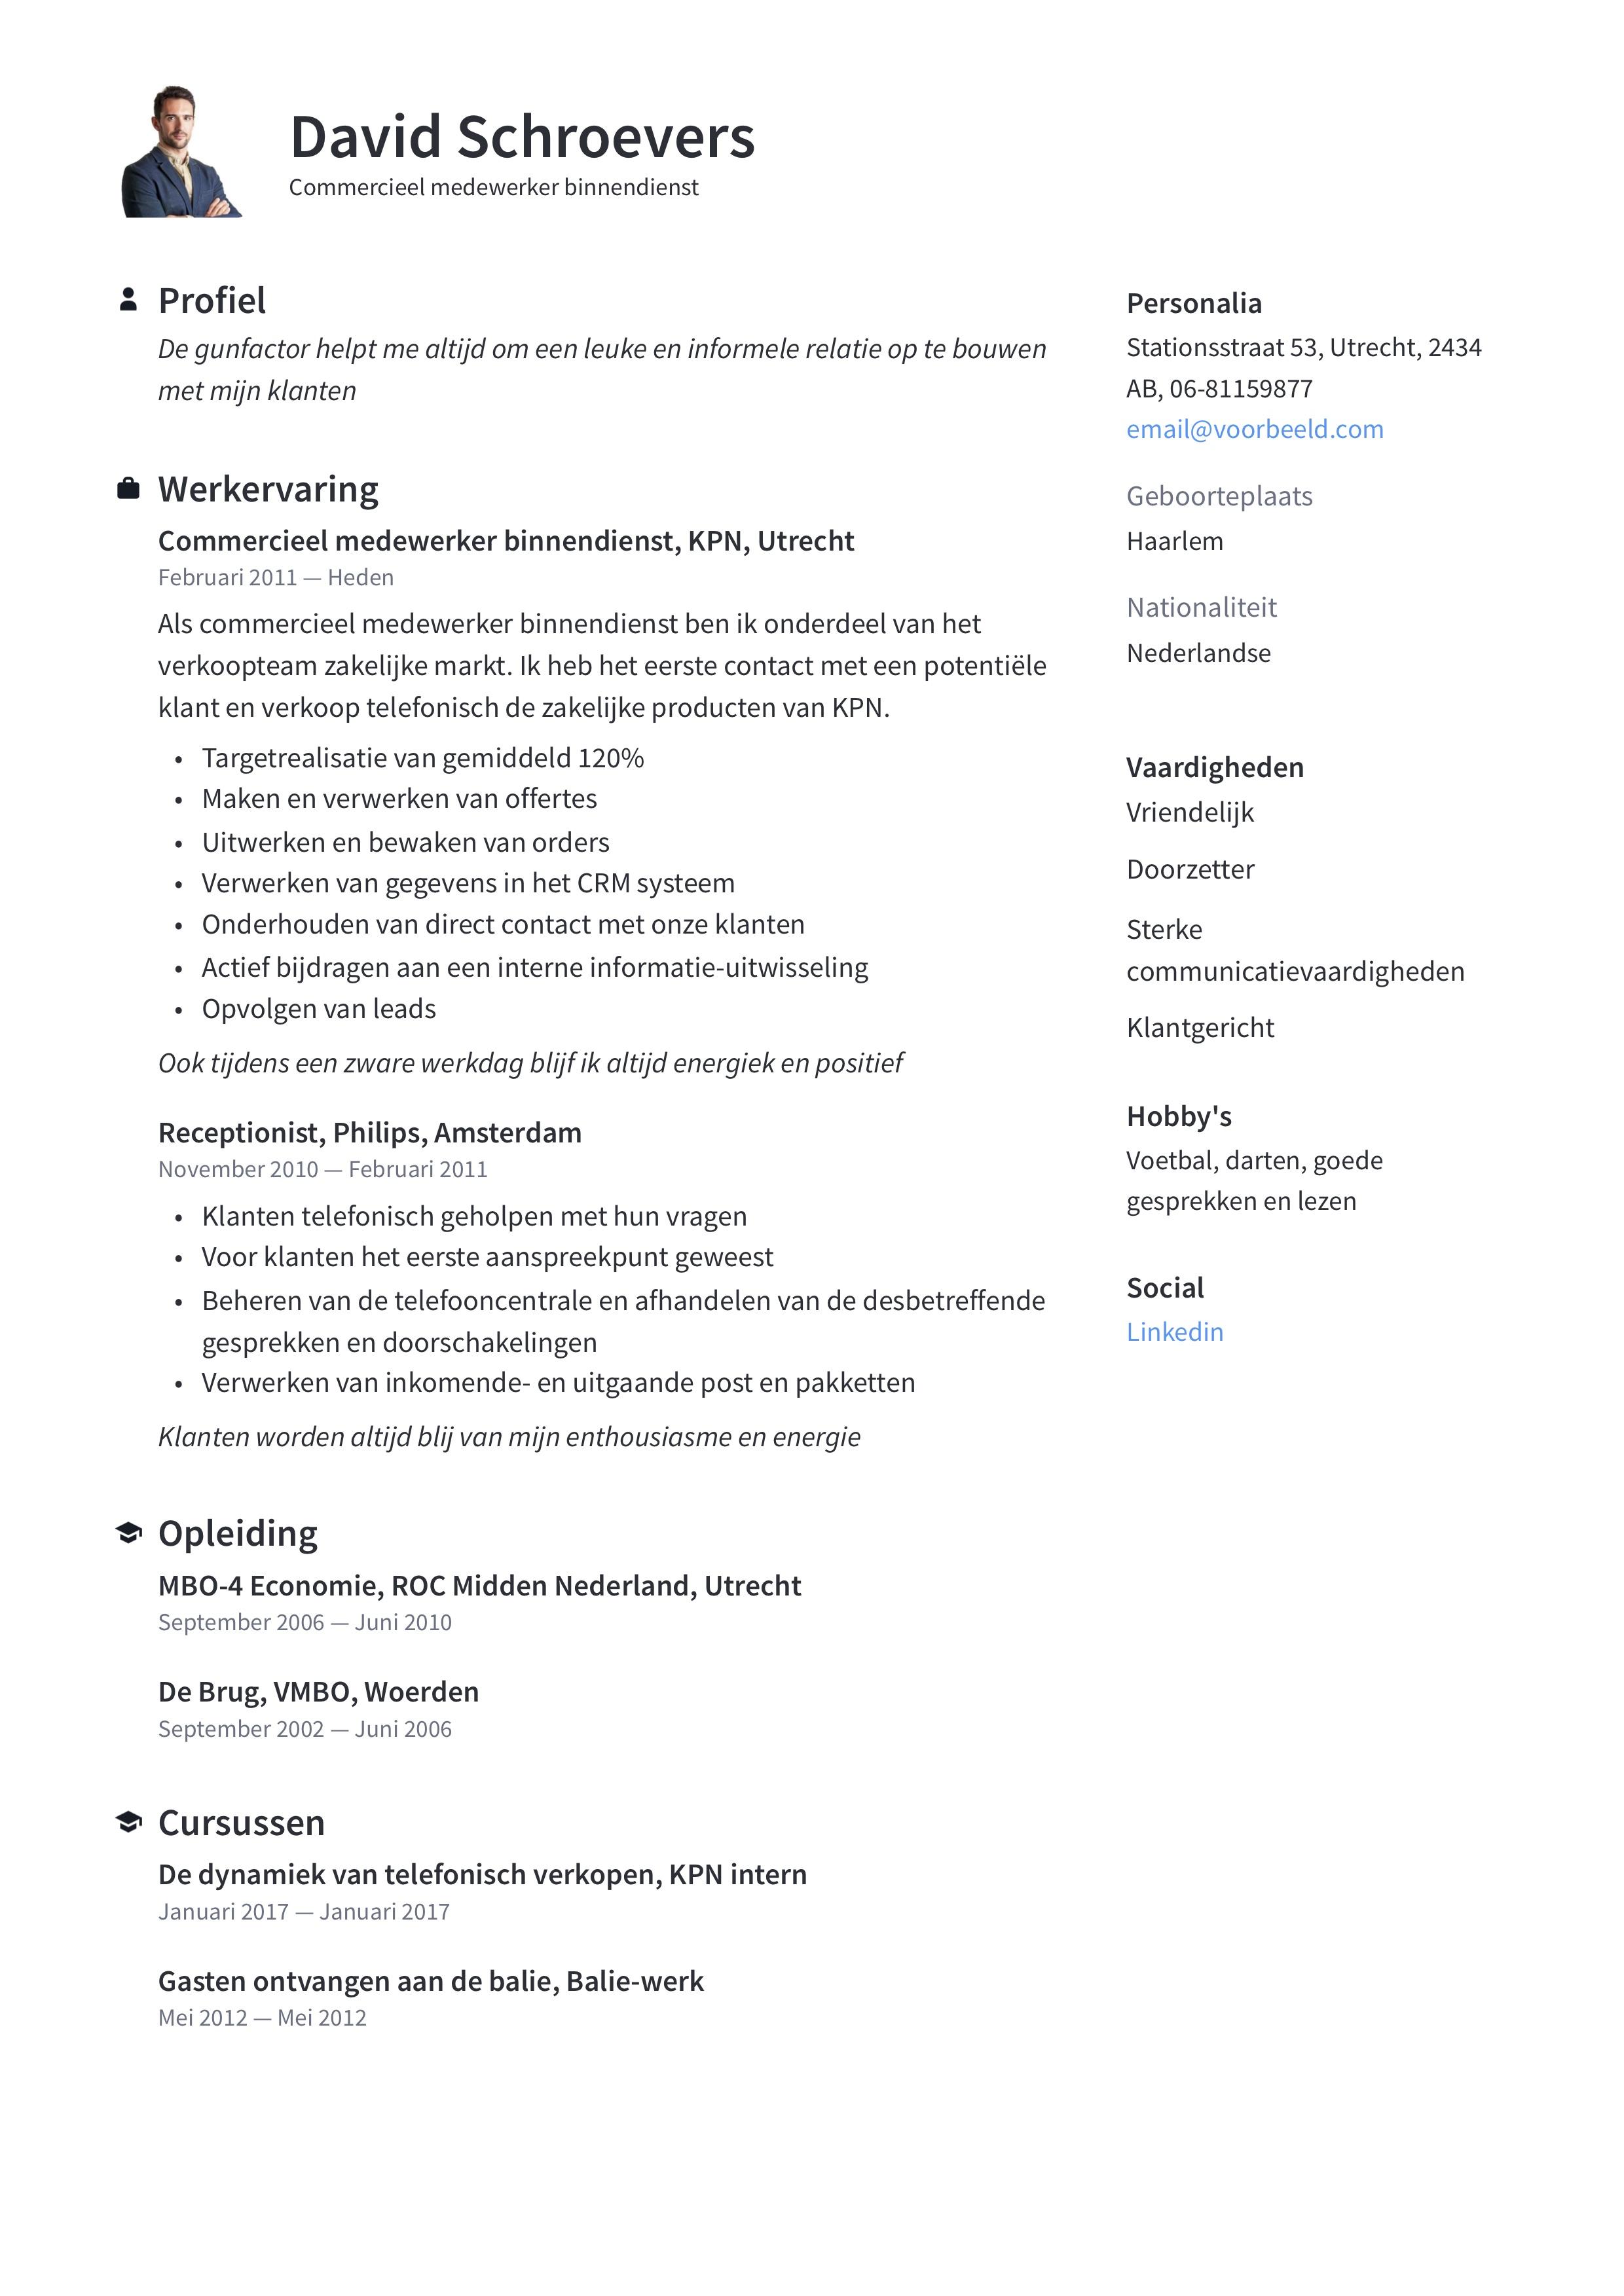 Commercieel medewerker binnendienst CV Voorbeeld